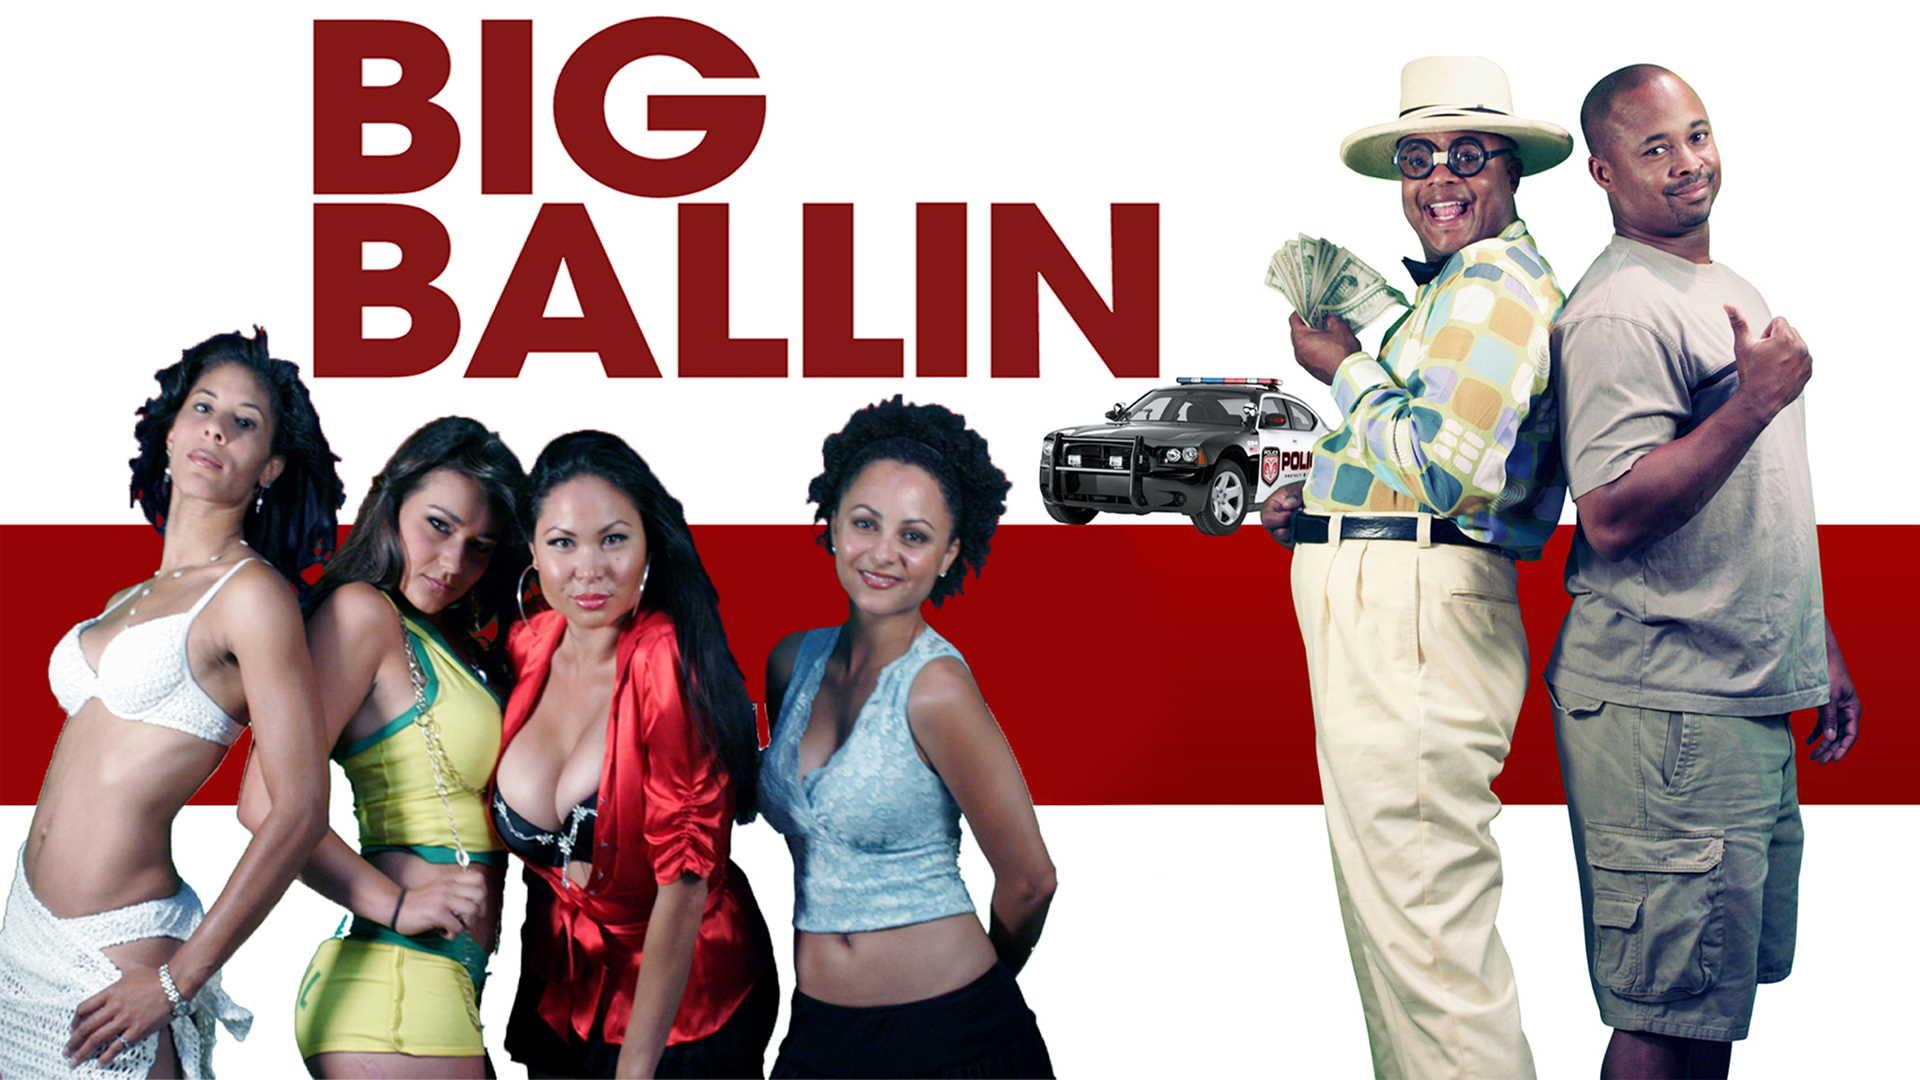 Big Ballin